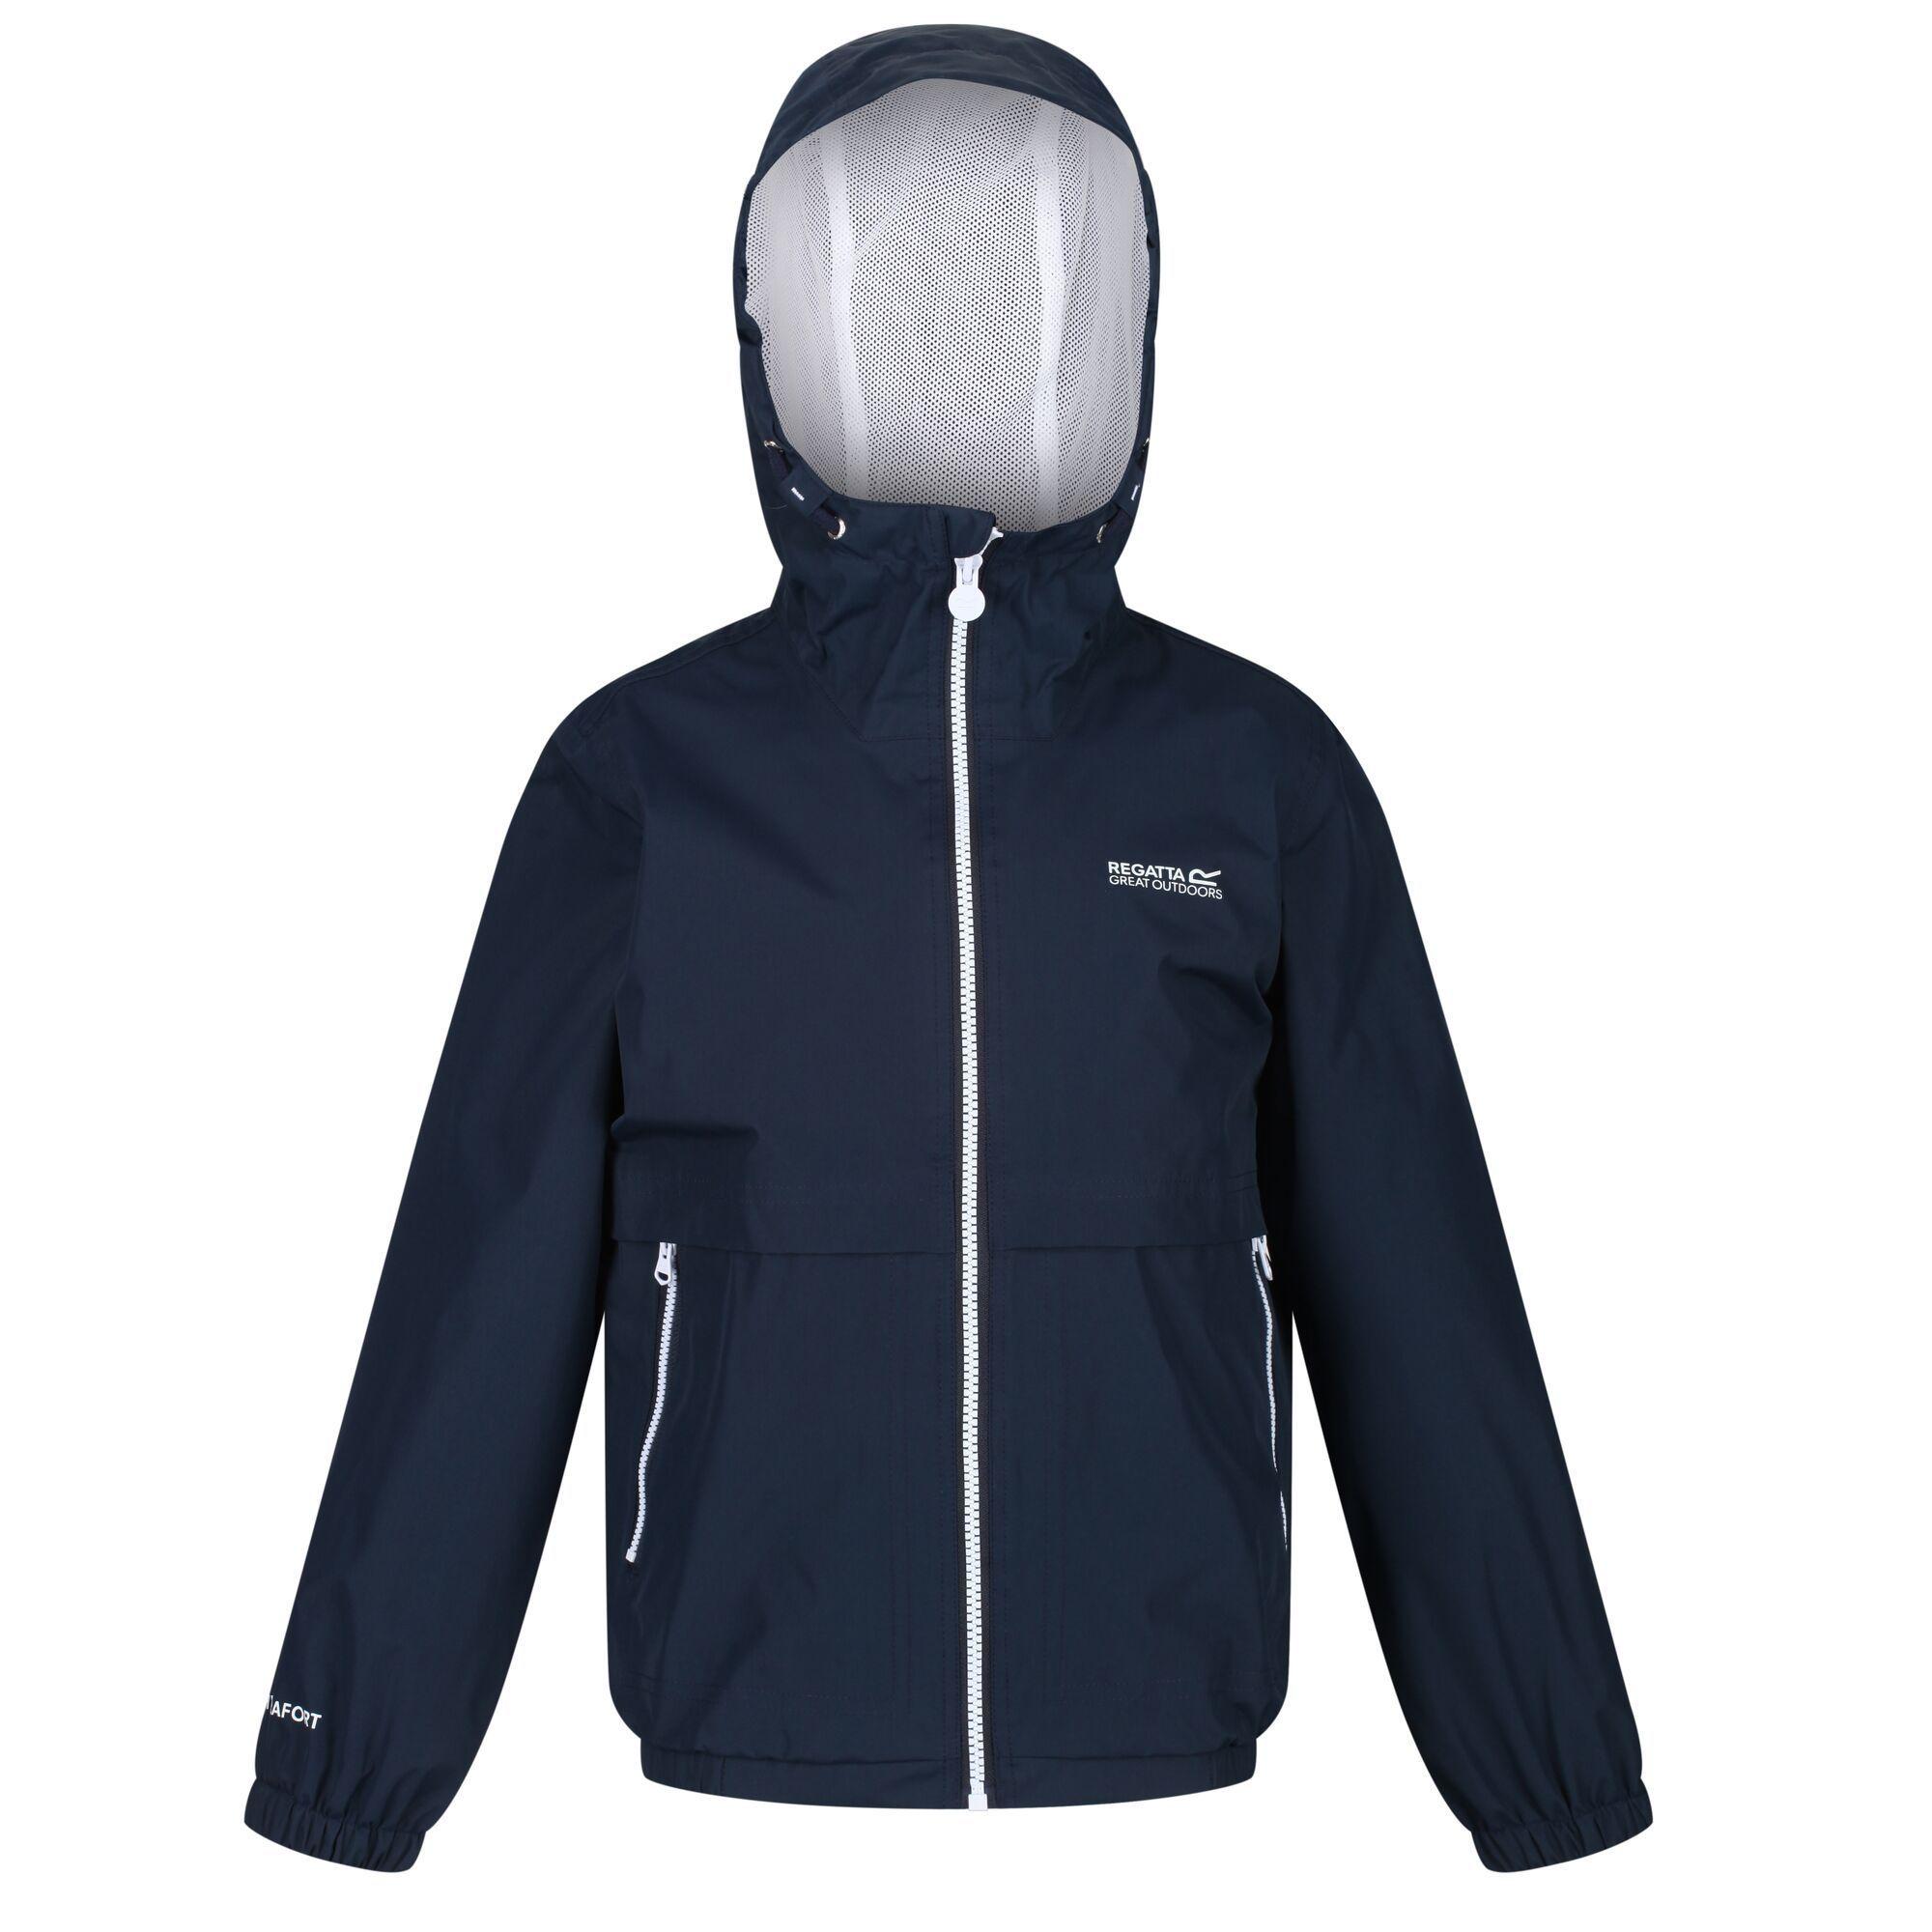 Regatta Childrens/Kids Haskel Waterproof Jacket